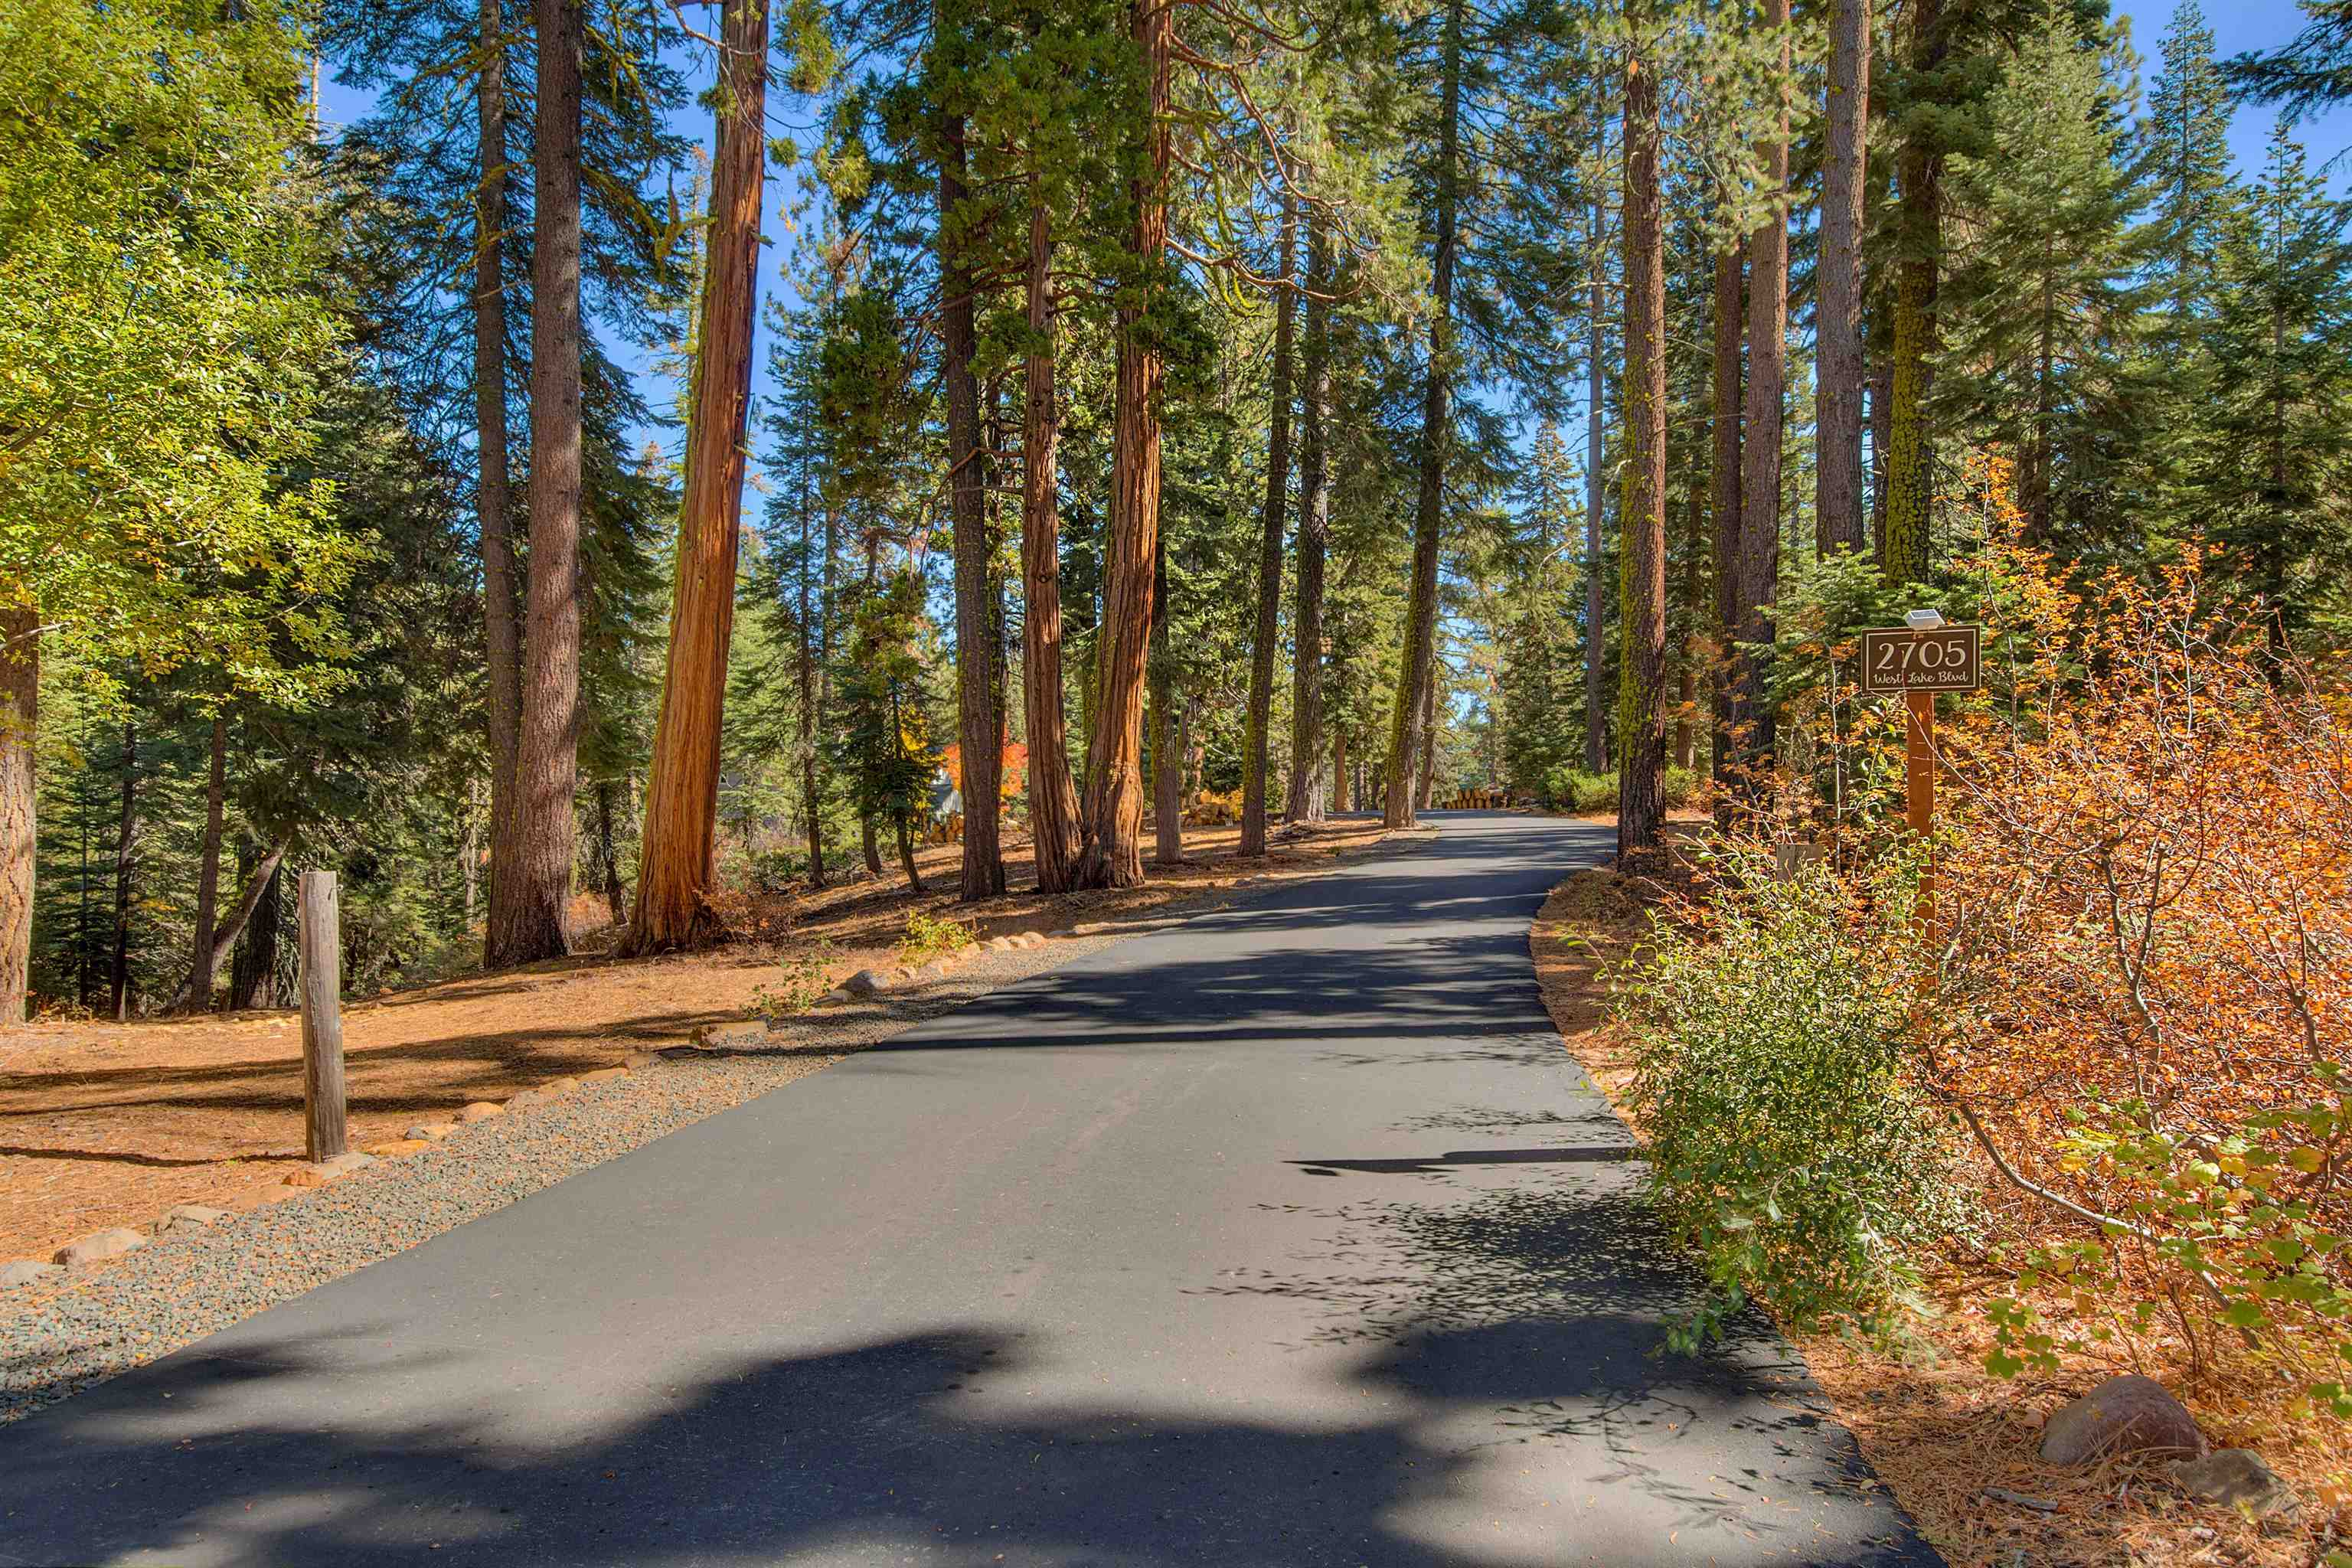 Image for 2705 West Lake Boulevard, Tahoe City, CA 96145